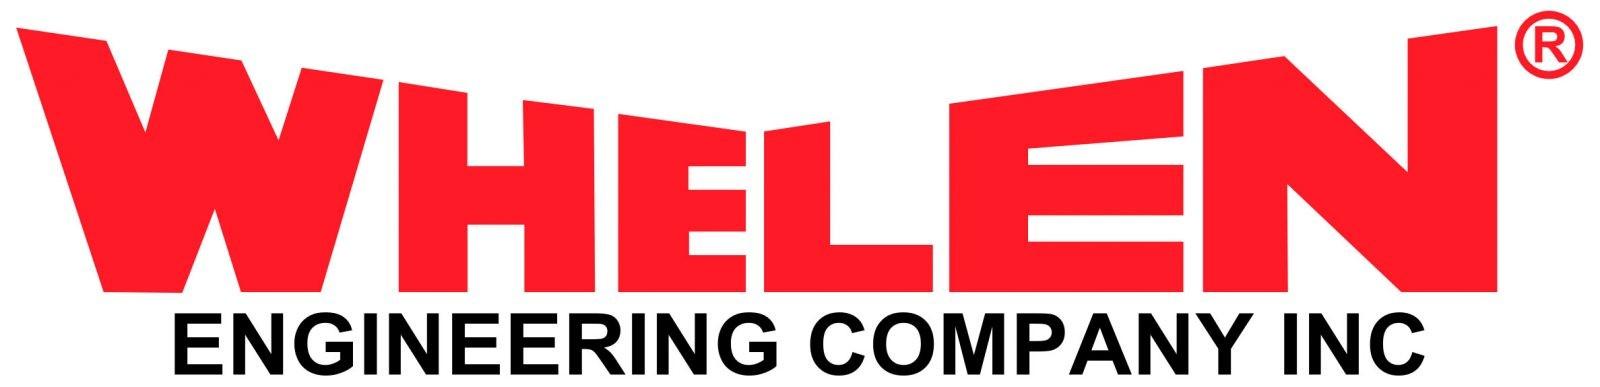 Whelen Engineering Company Inc logo